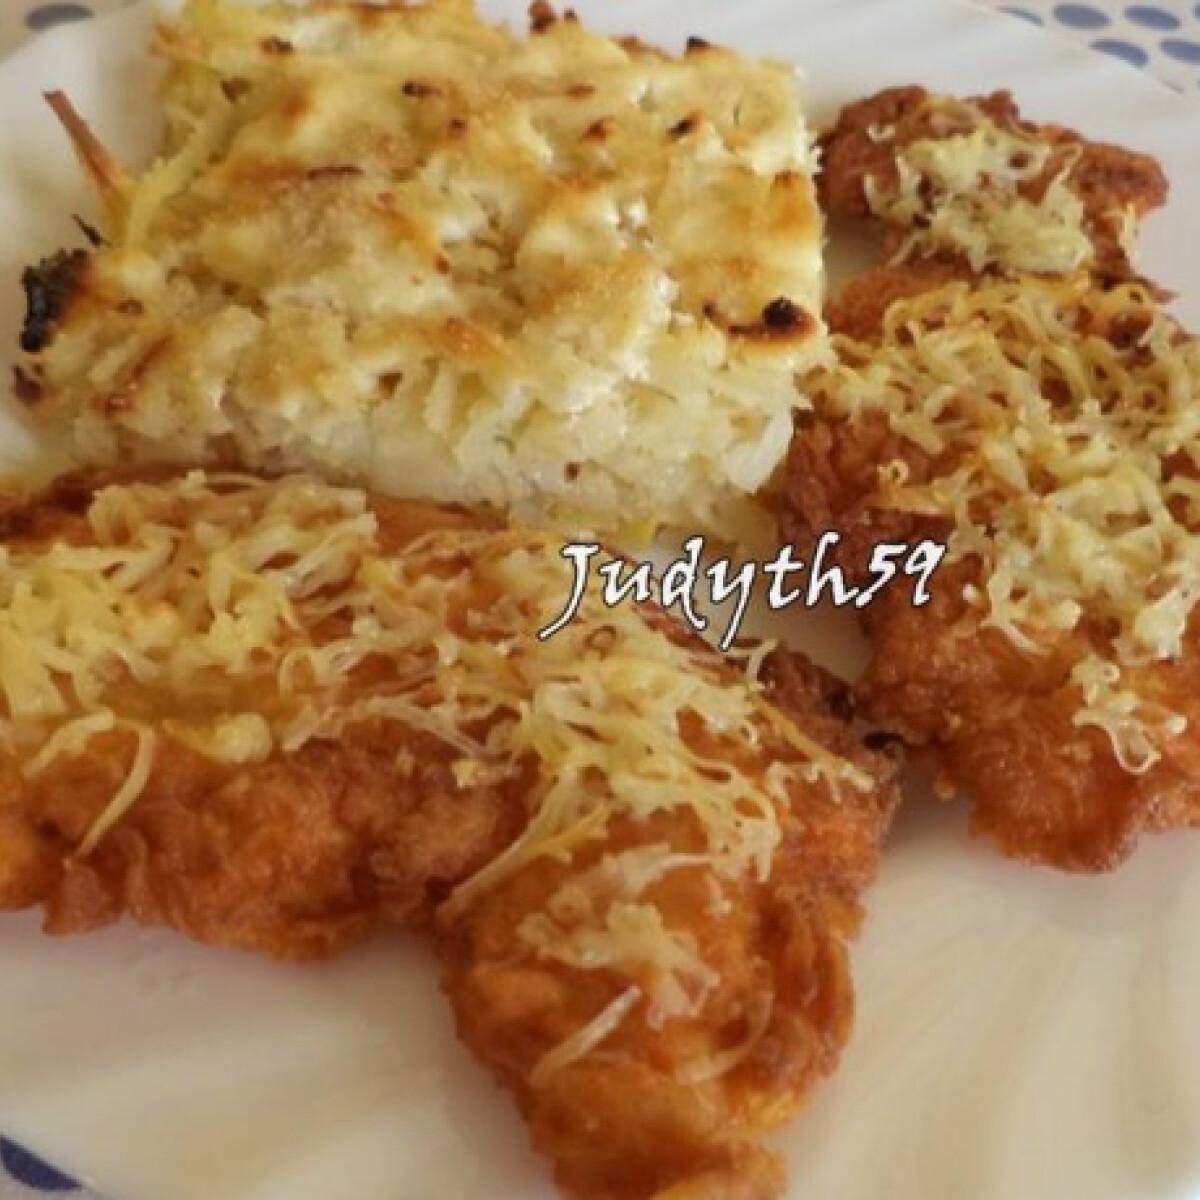 Ínyenc csirkemell háromsajtos burgonyakörettel